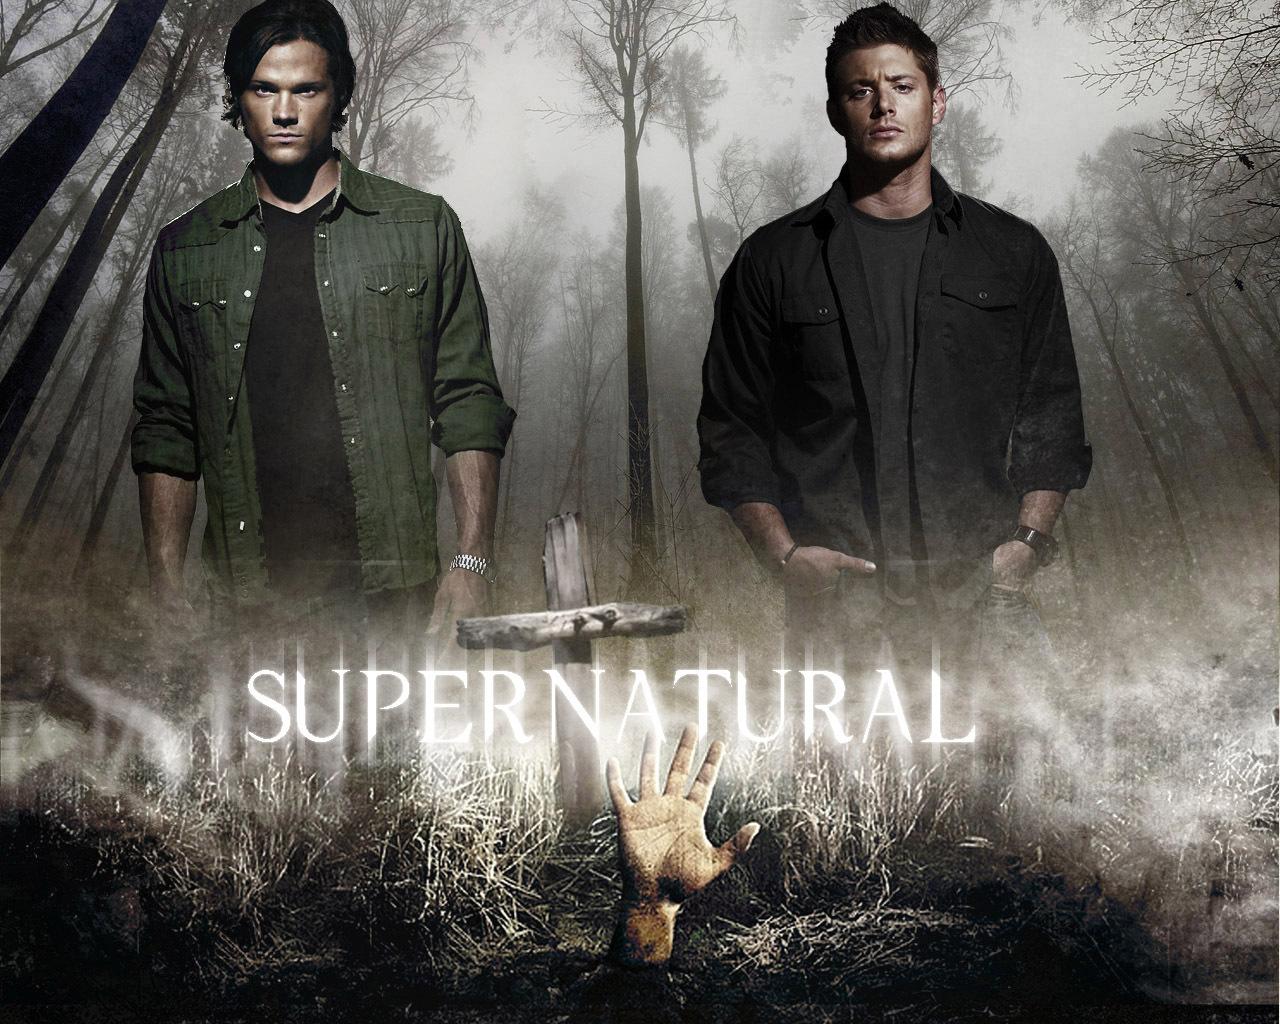 http://2.bp.blogspot.com/_nsOD6tAwsDw/TUEY7-co3iI/AAAAAAAAAe8/_oWa_ut0n10/s1600/wDean-Sam-supernatural-4527072-1280-1024.jpg